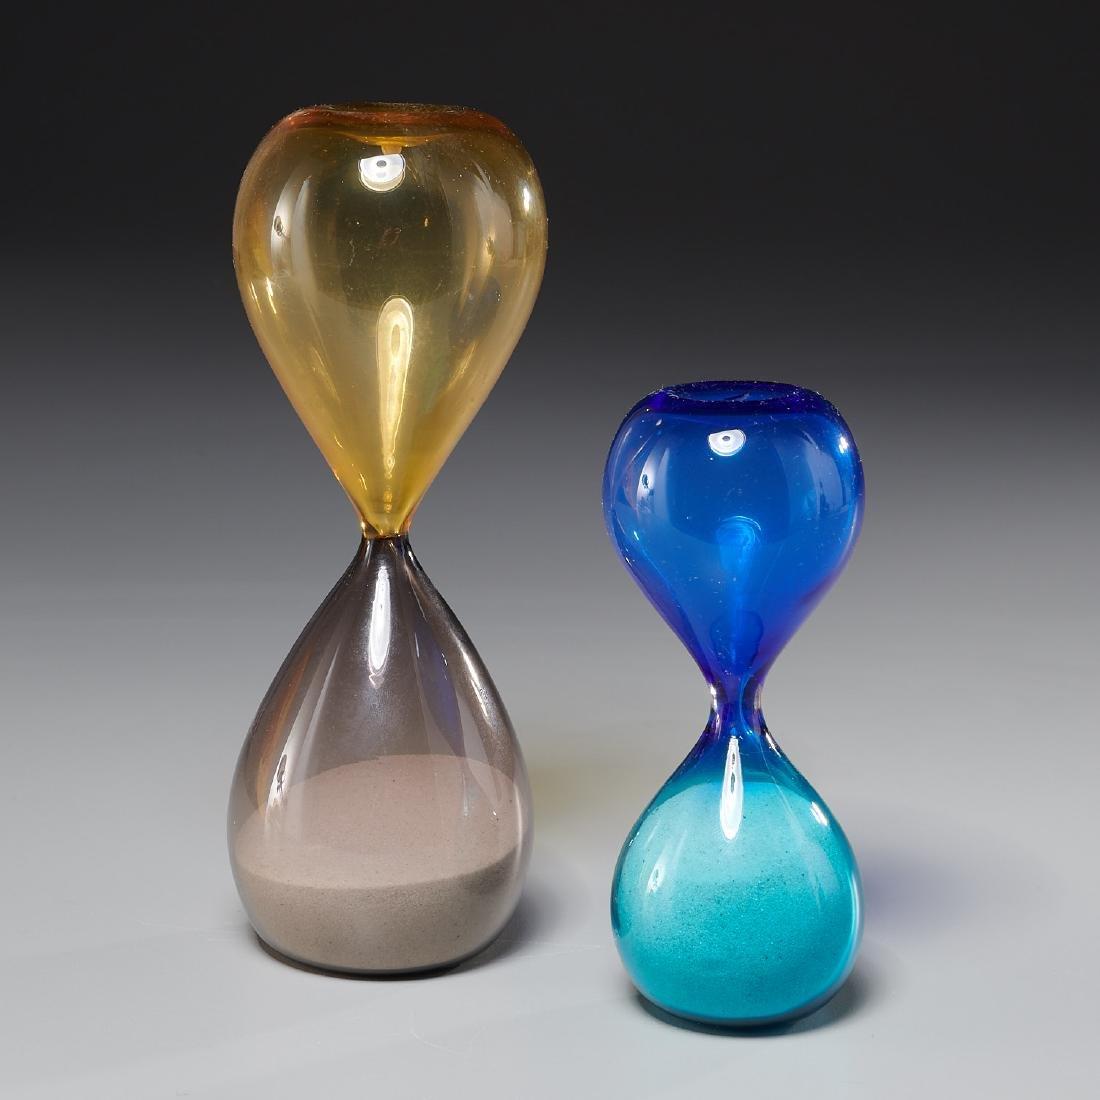 (2) Venini Clessidra hourglasses